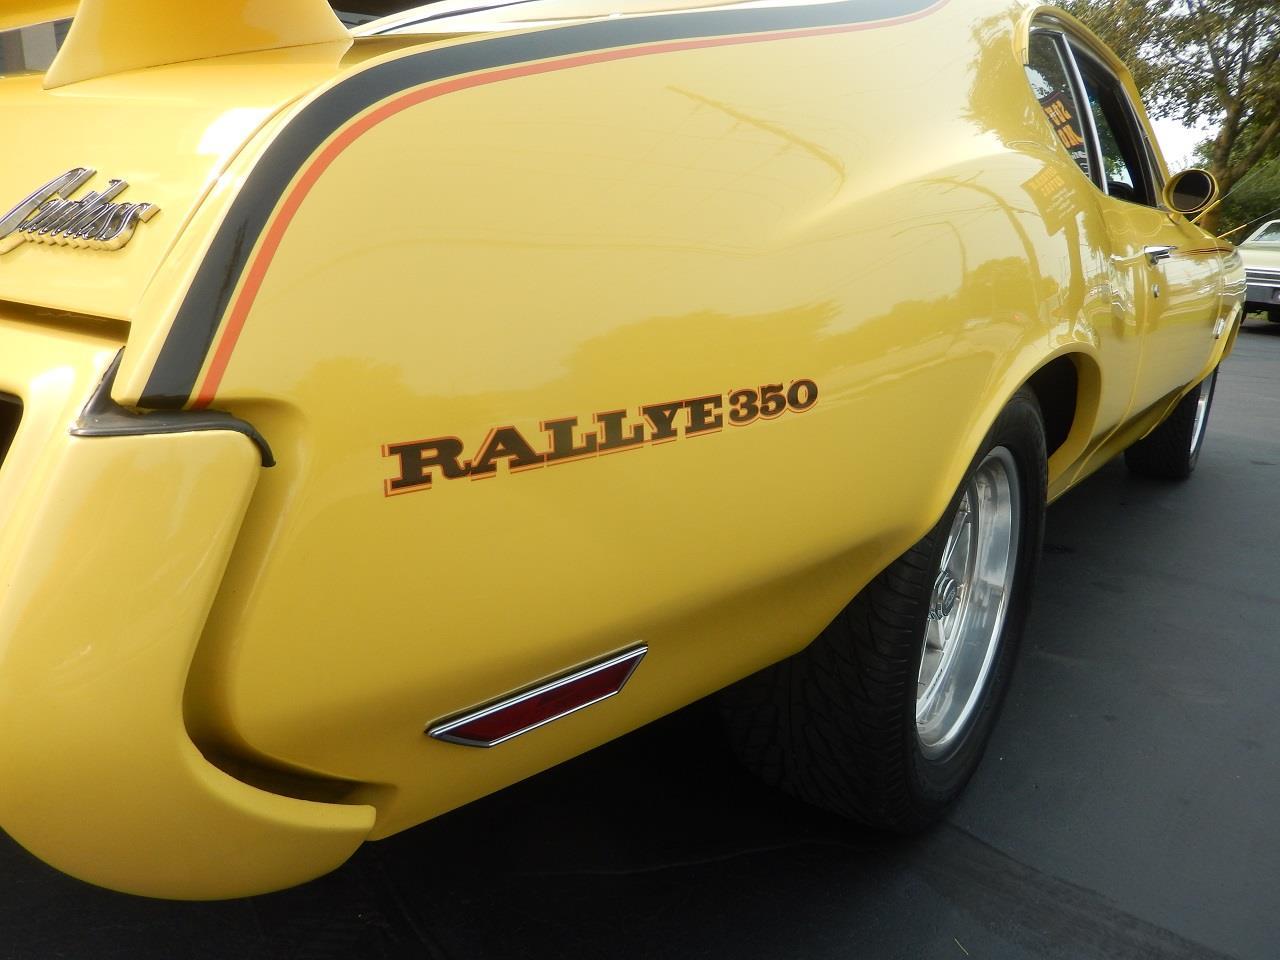 1970 Oldsmobile Rallye 350 (CC-1390628) for sale in Clarkston, Michigan